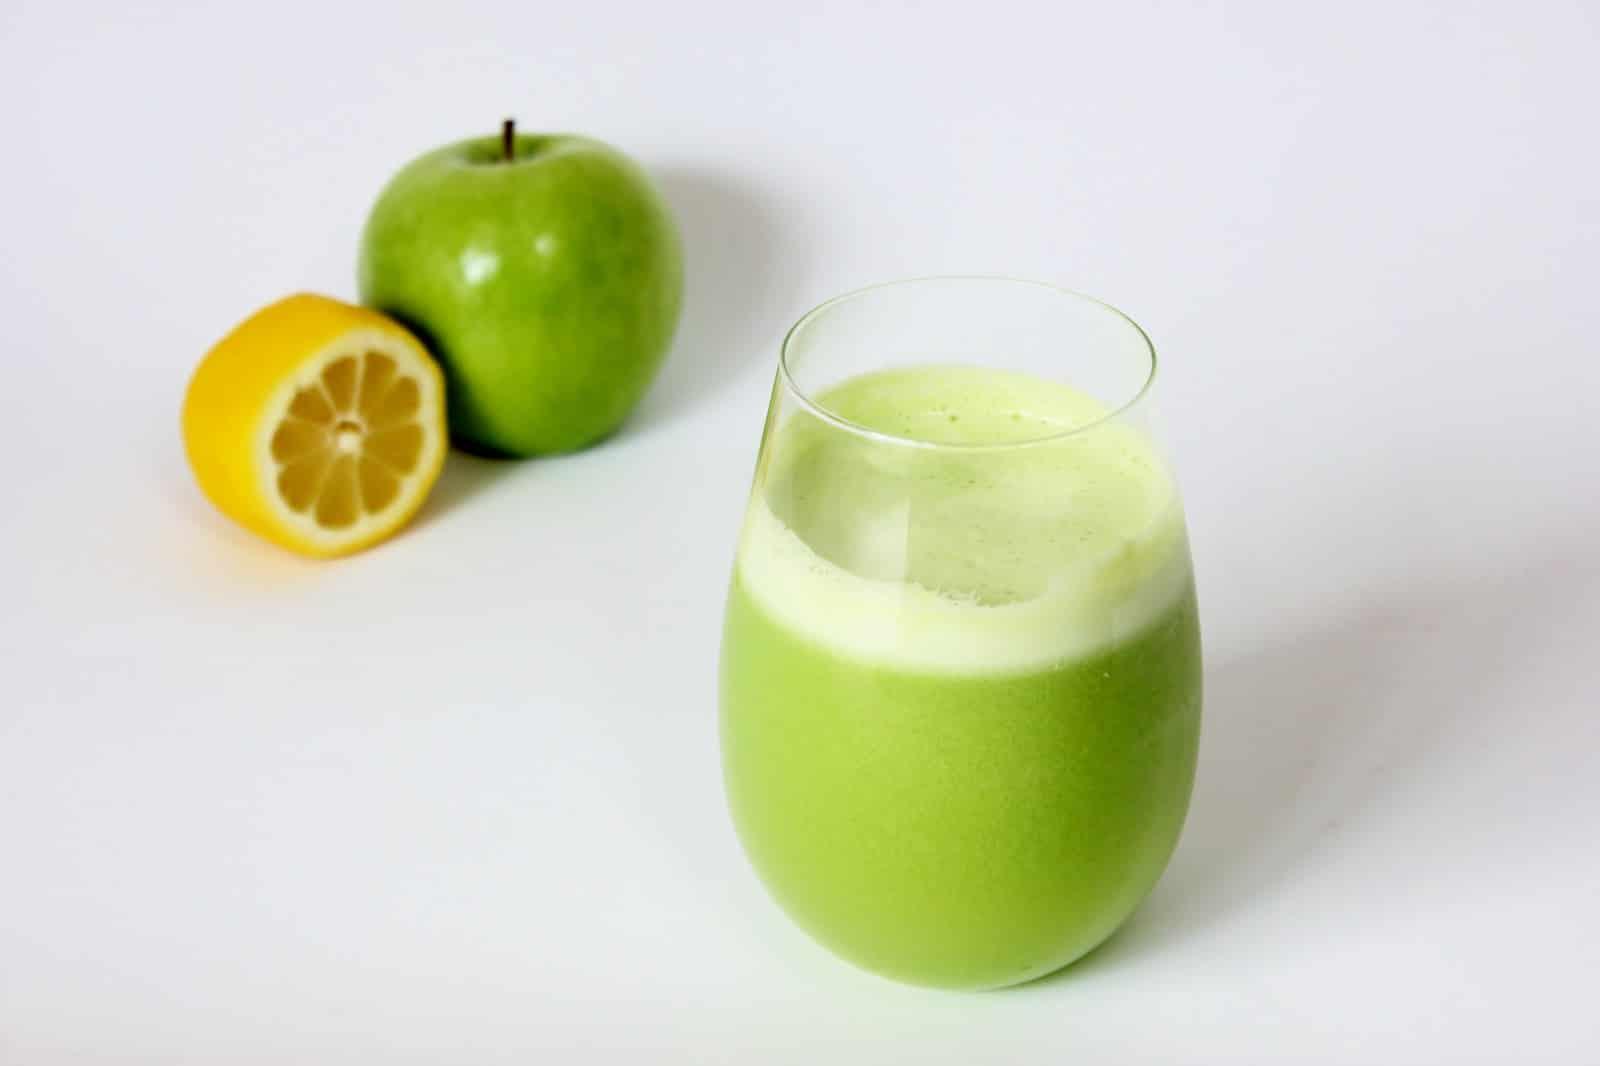 celery kale juice วิธีทำสมูทตี้ลดหน้าท้อง เคล ซุปเปอร์ฟู้ด organic superfoods seeds Thailand healthplatz